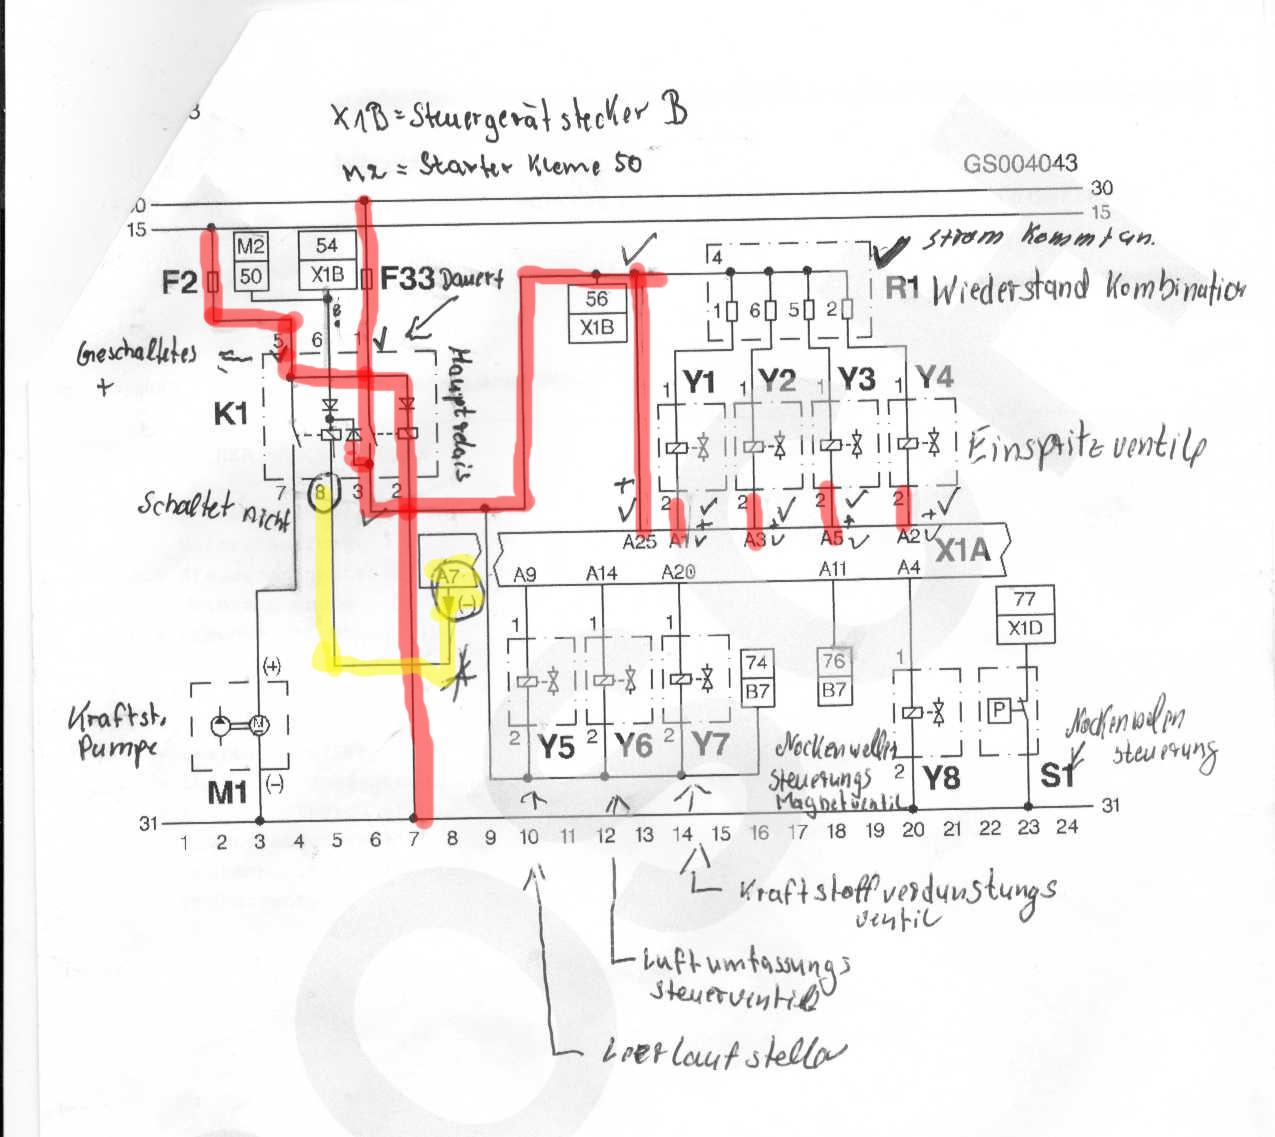 Fein 990 Schaltplan Honda Civic Fotos - Elektrische Schaltplan-Ideen ...